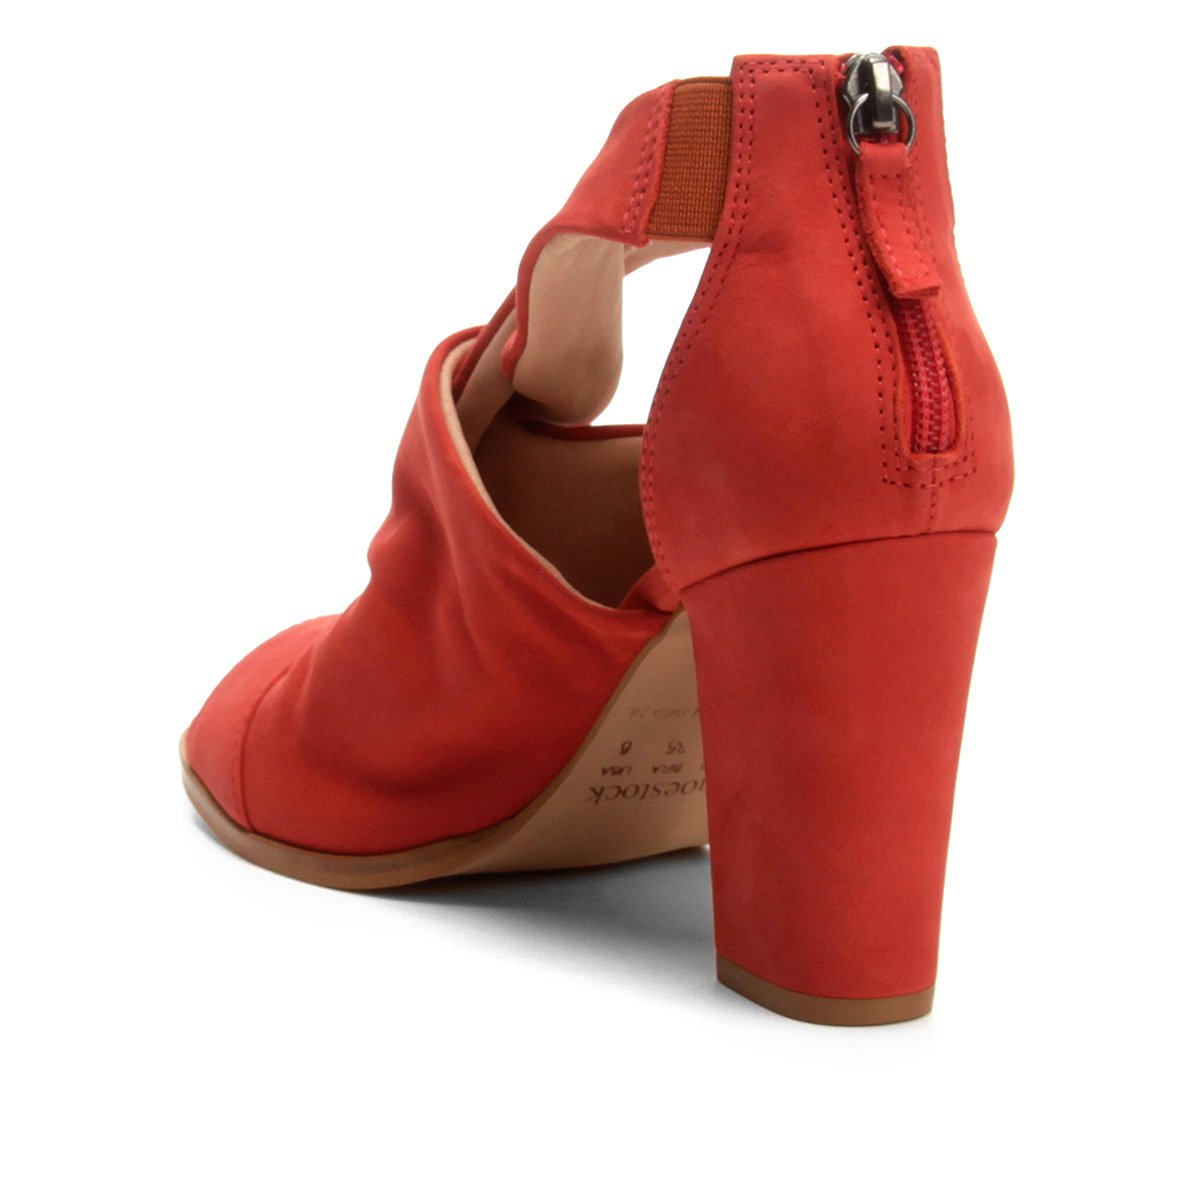 Sandália Shoestock Couro Couro Grosso Salto Entrelace Sandália Grosso Shoestock Feminina Vermelho Salto q4BA1wfxq